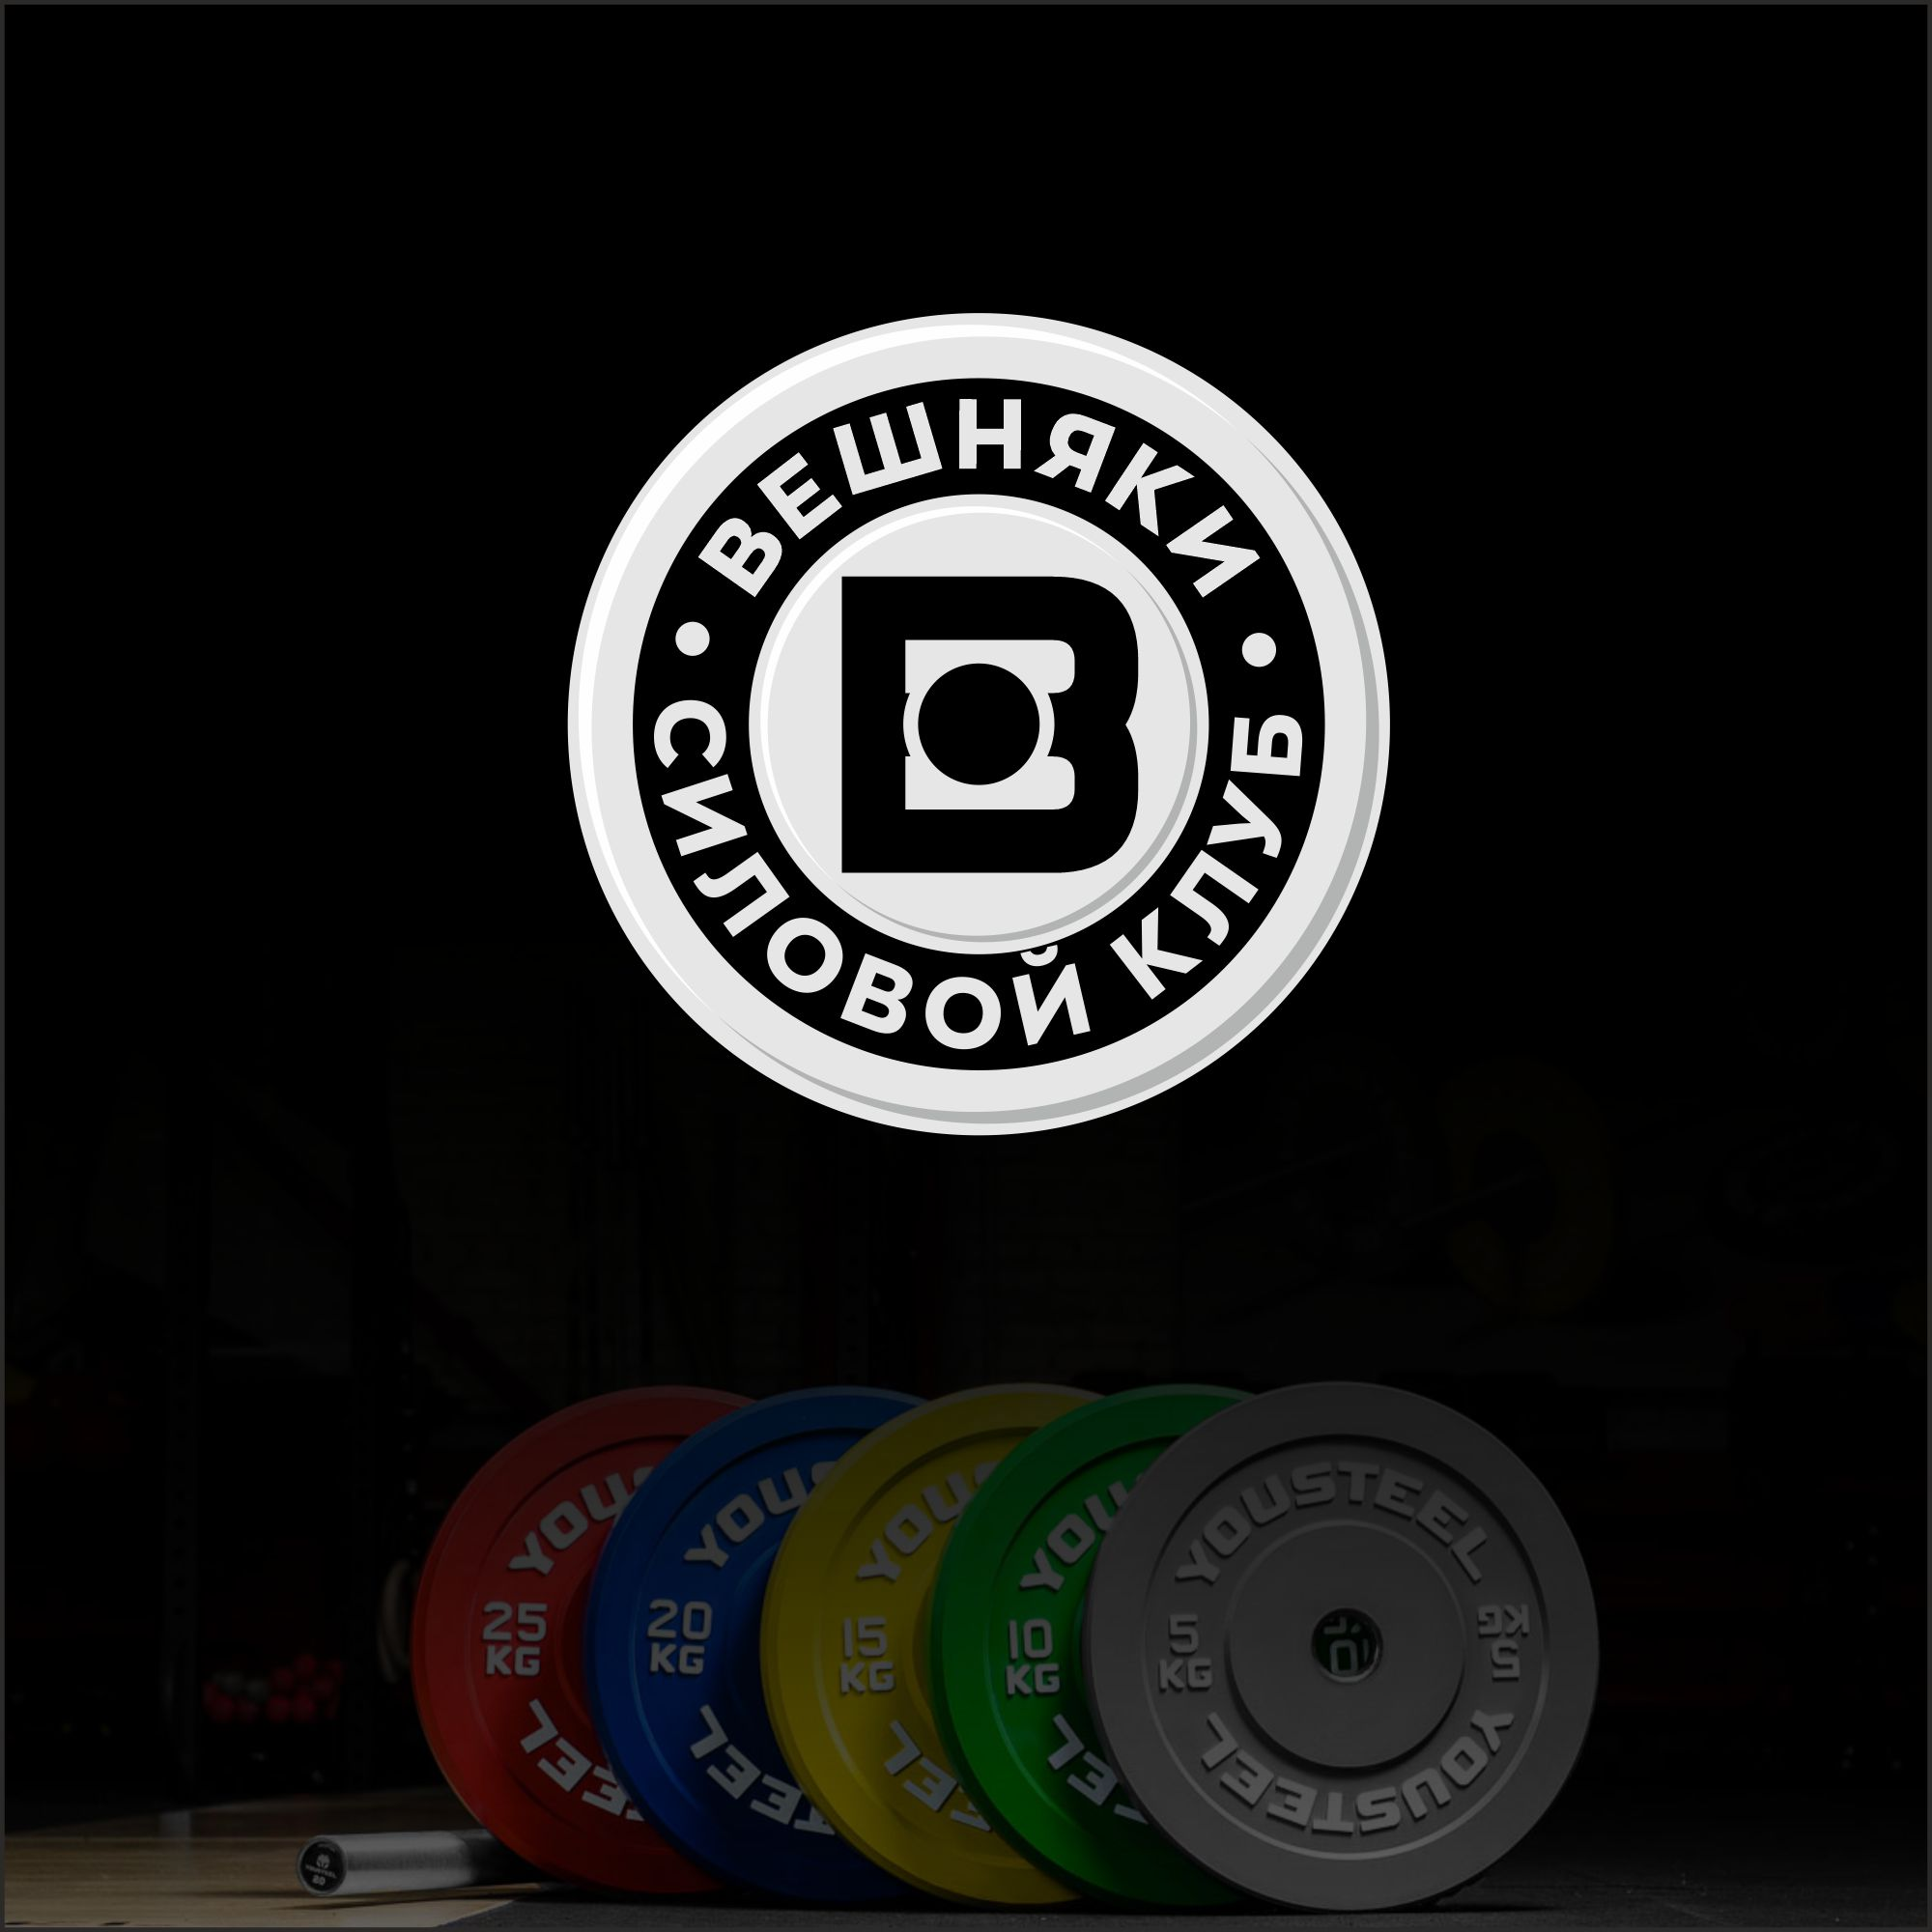 Адаптация (разработка) логотипа Силового клуба ВЕШНЯКИ в инт фото f_6135fbf371893a07.jpg